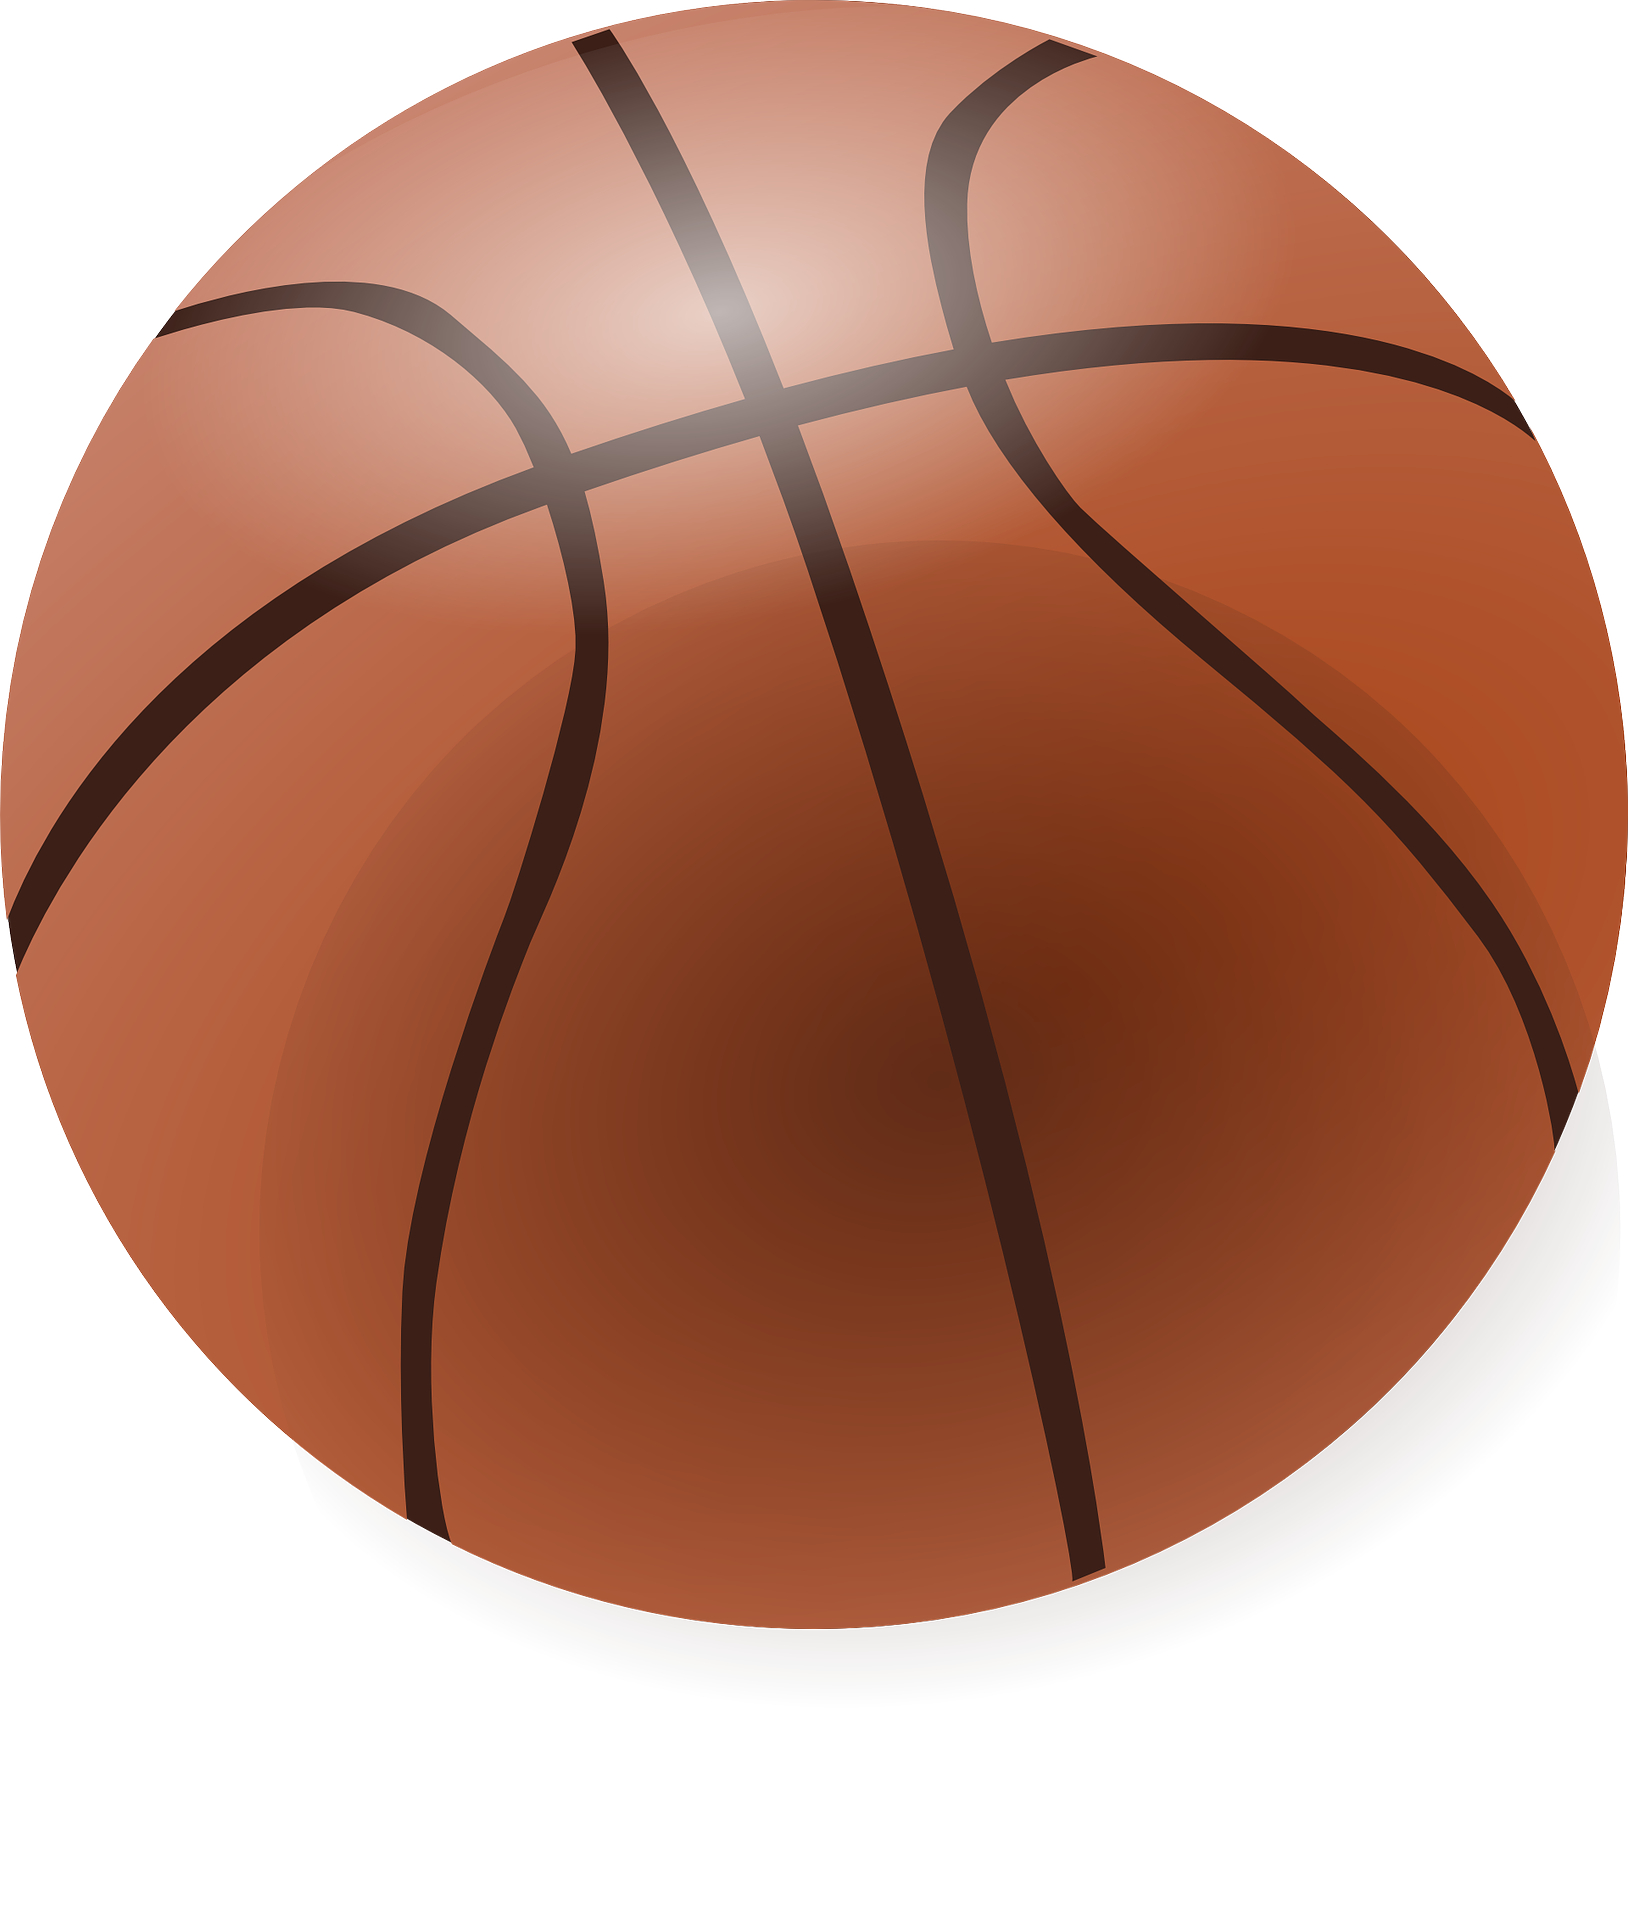 brown basketball vector